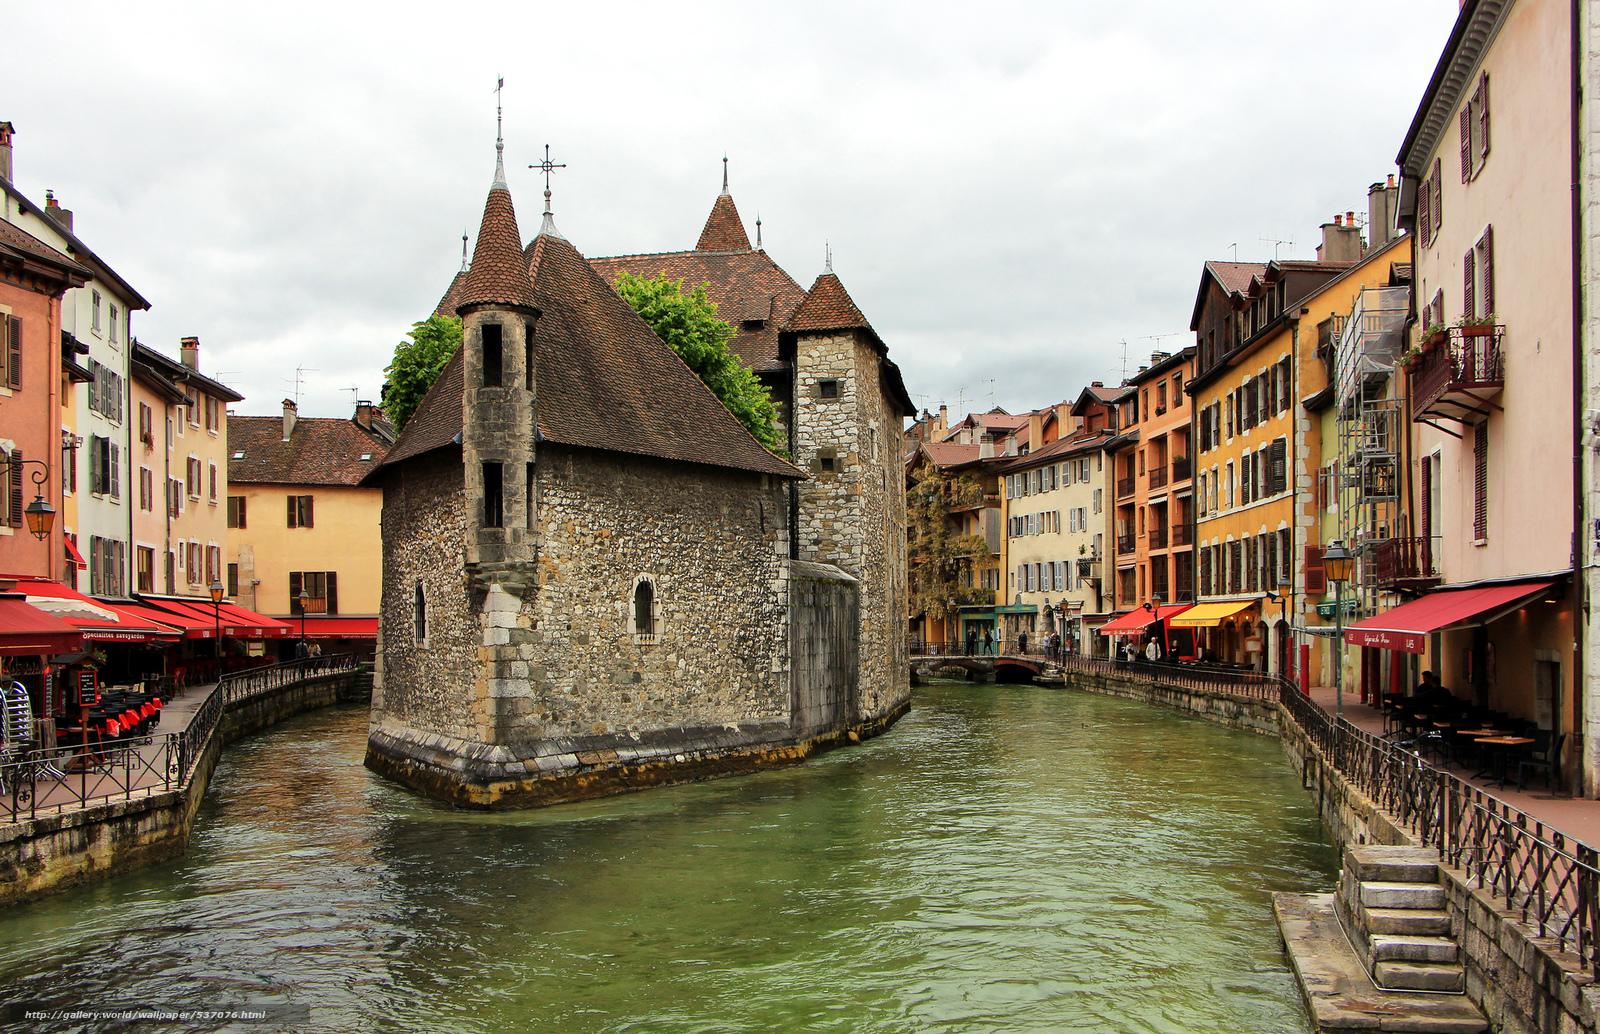 Download wallpaper palais de l 39 isle annecy france free - Boutique free annecy ...